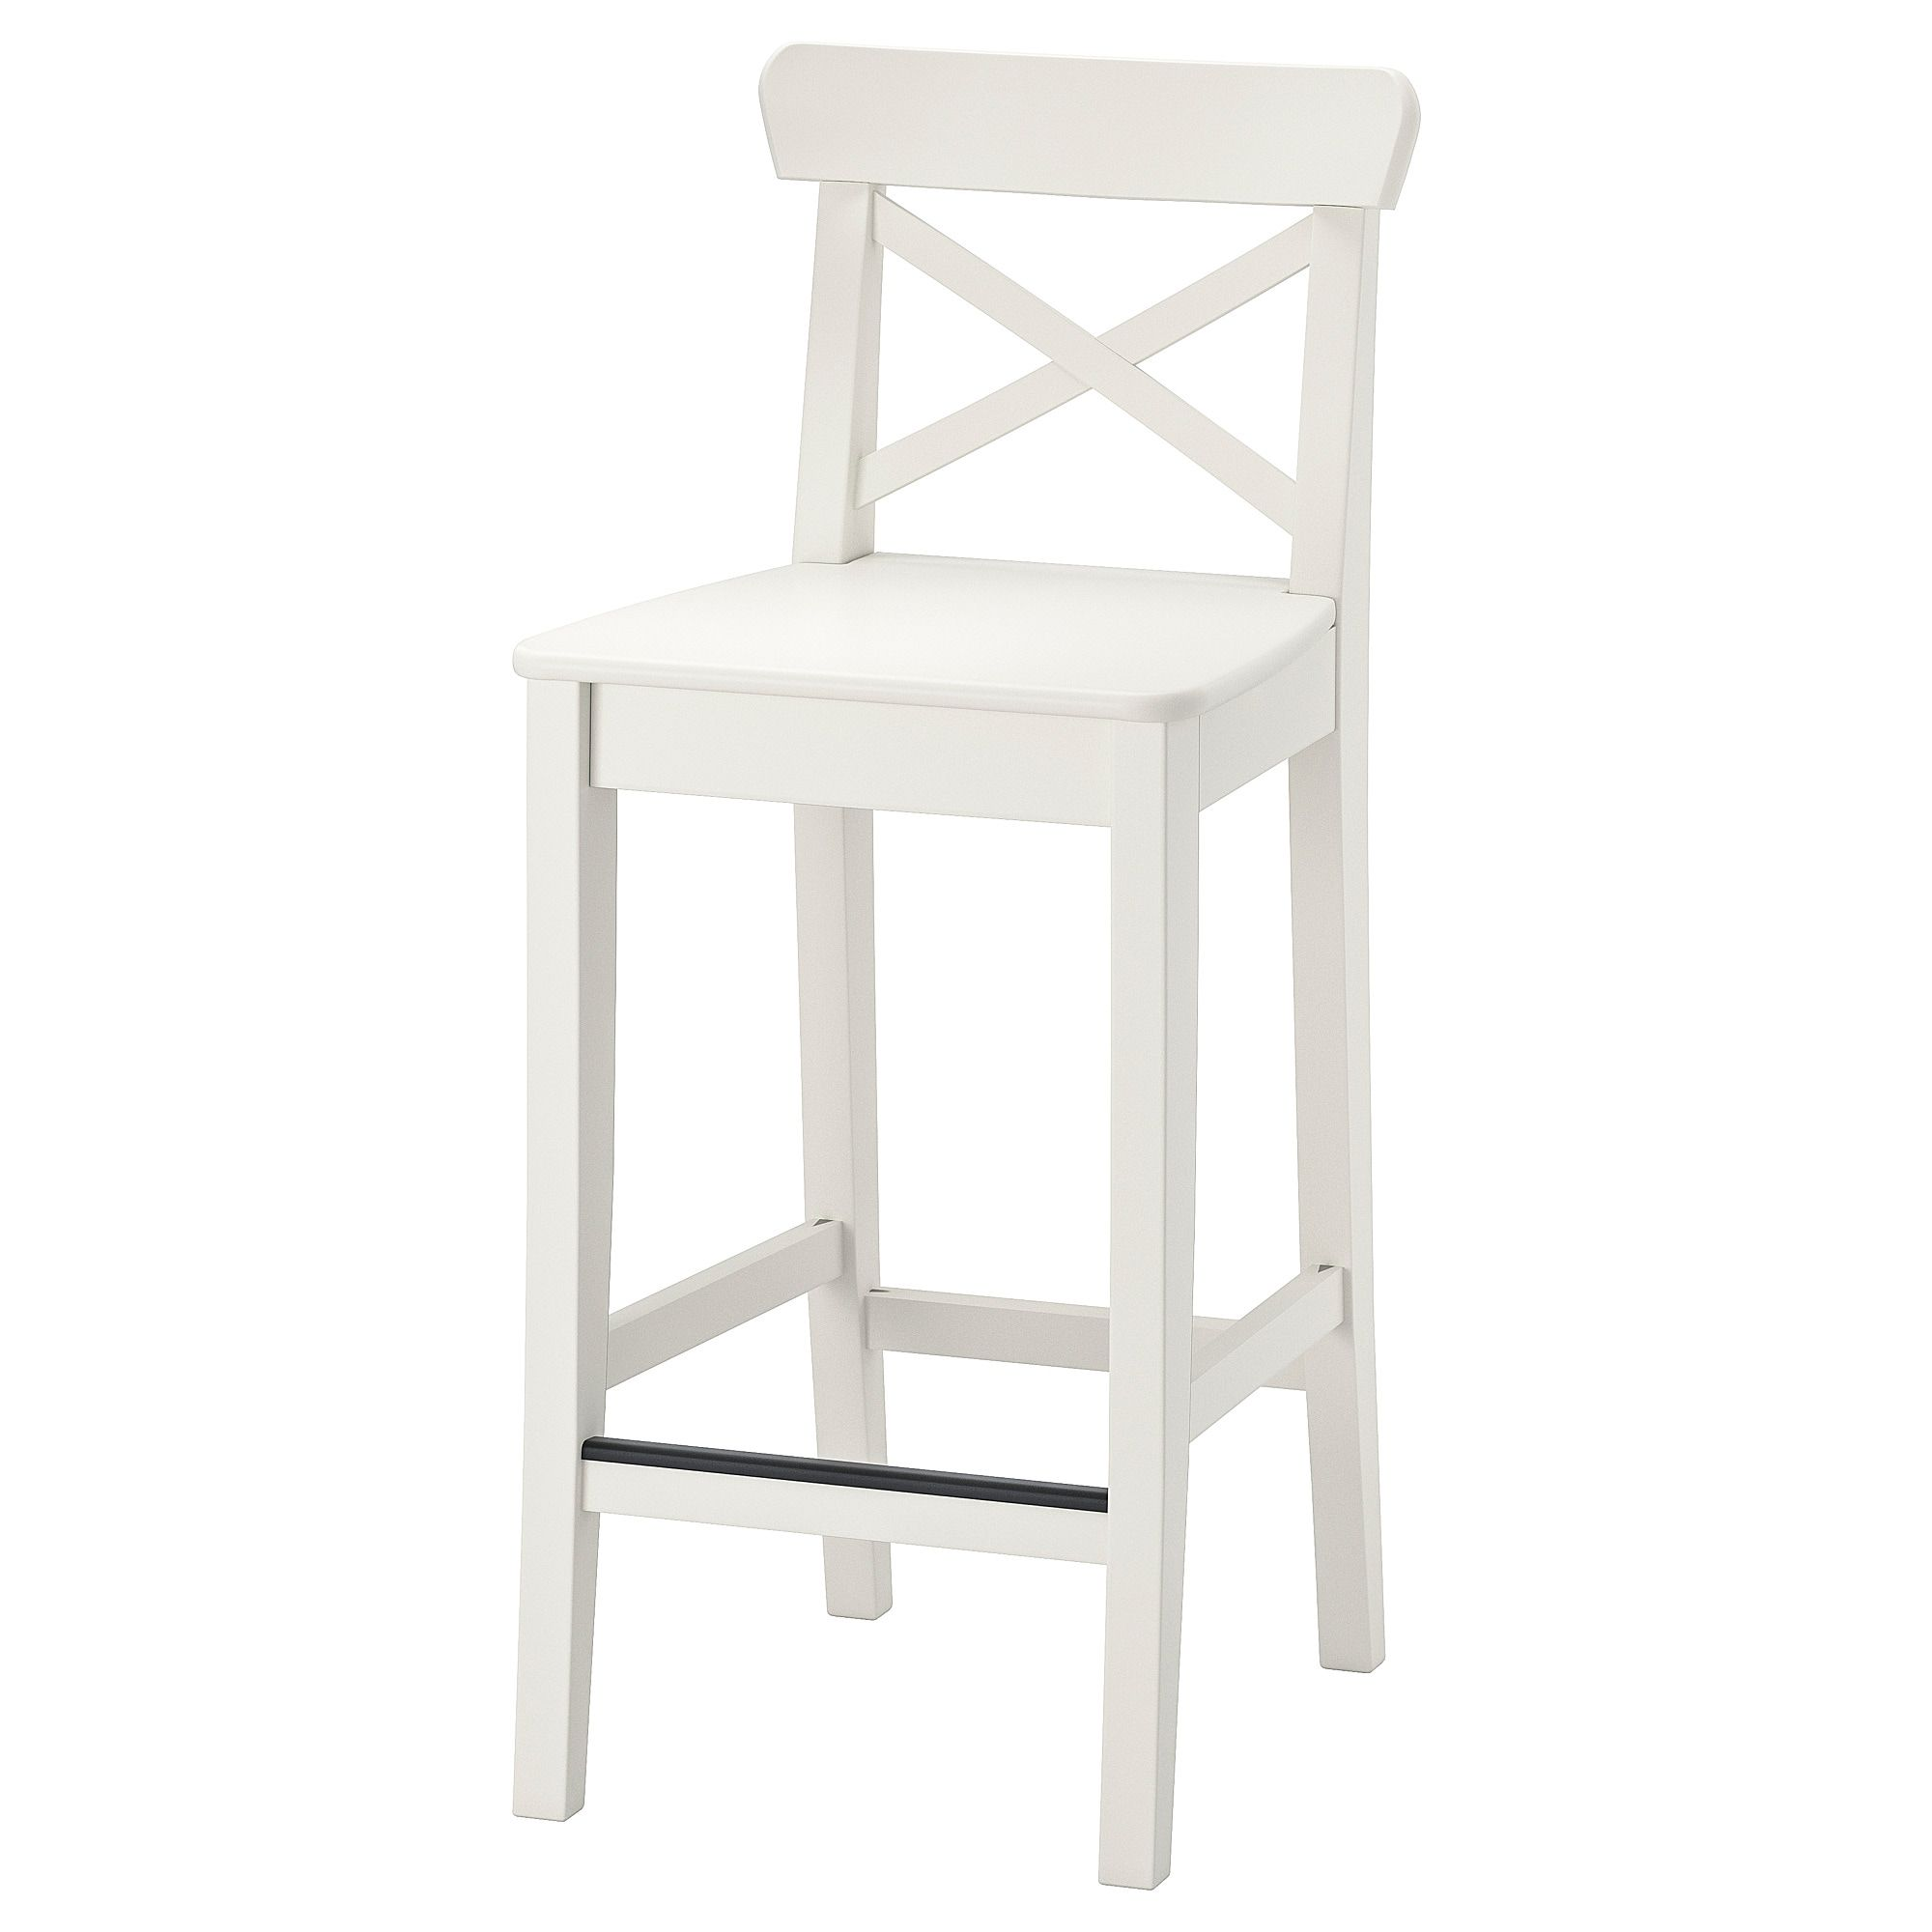 Ingolf Bar Stool With Backrest White 24 3 4 Ikea Bar Stools Ikea Bar Pub Furniture